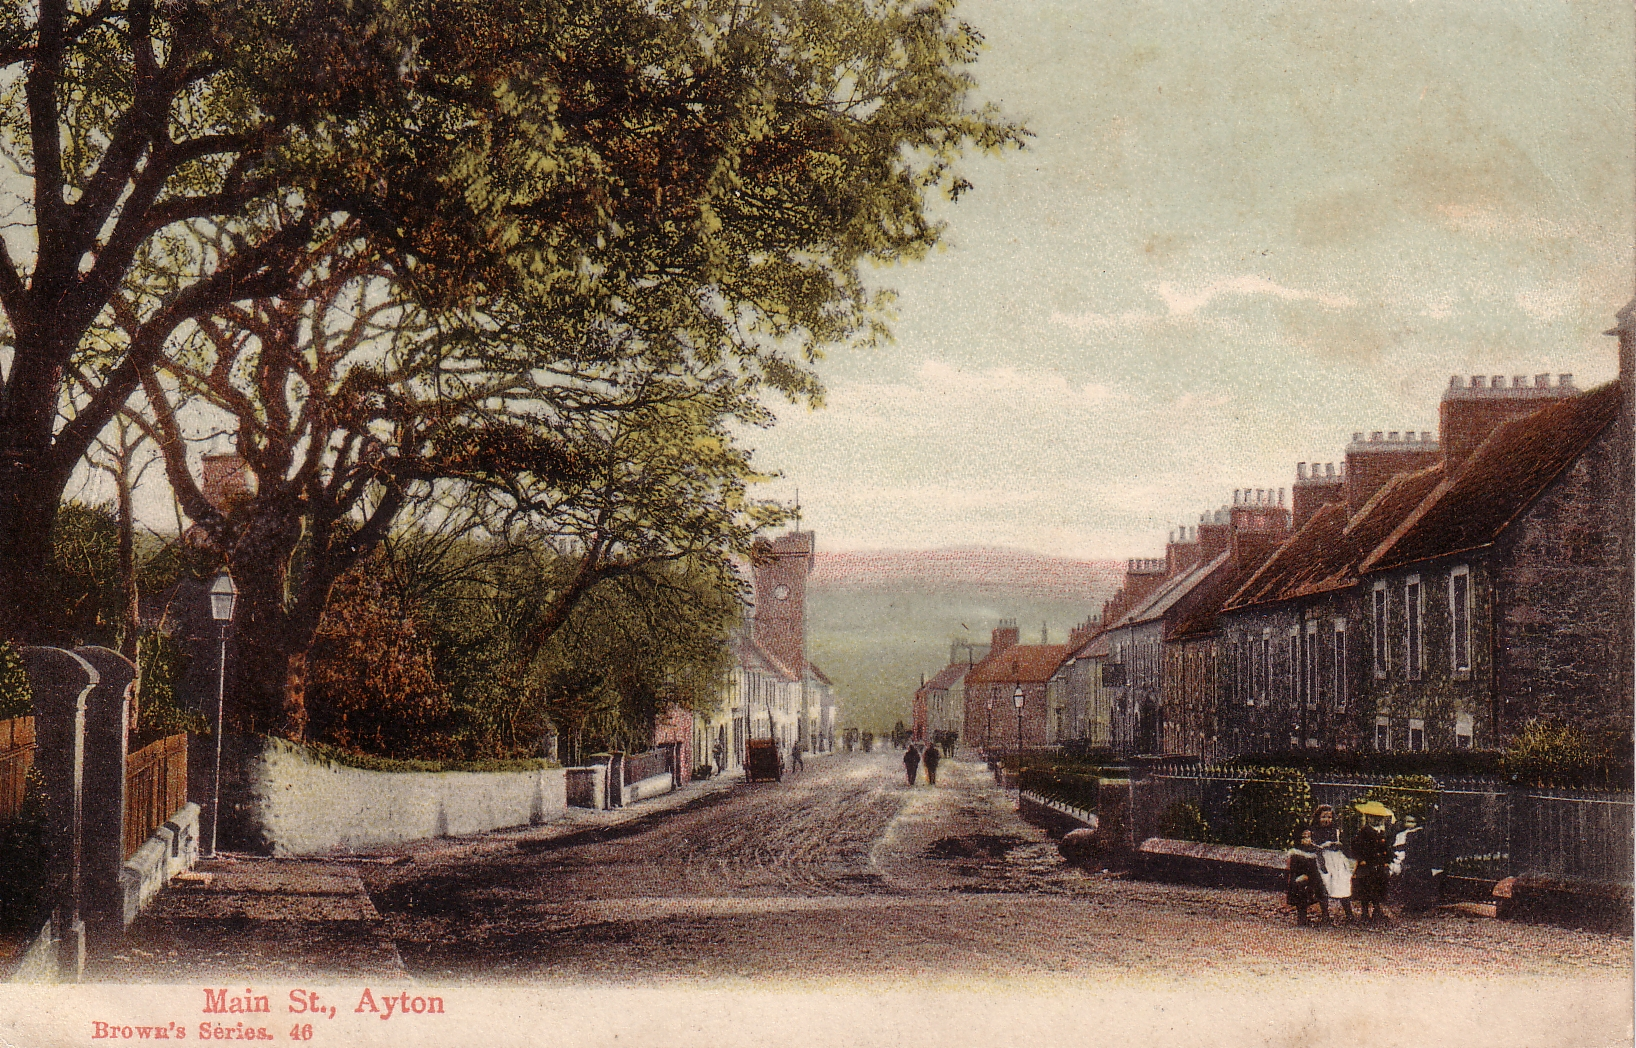 Main St Ayton